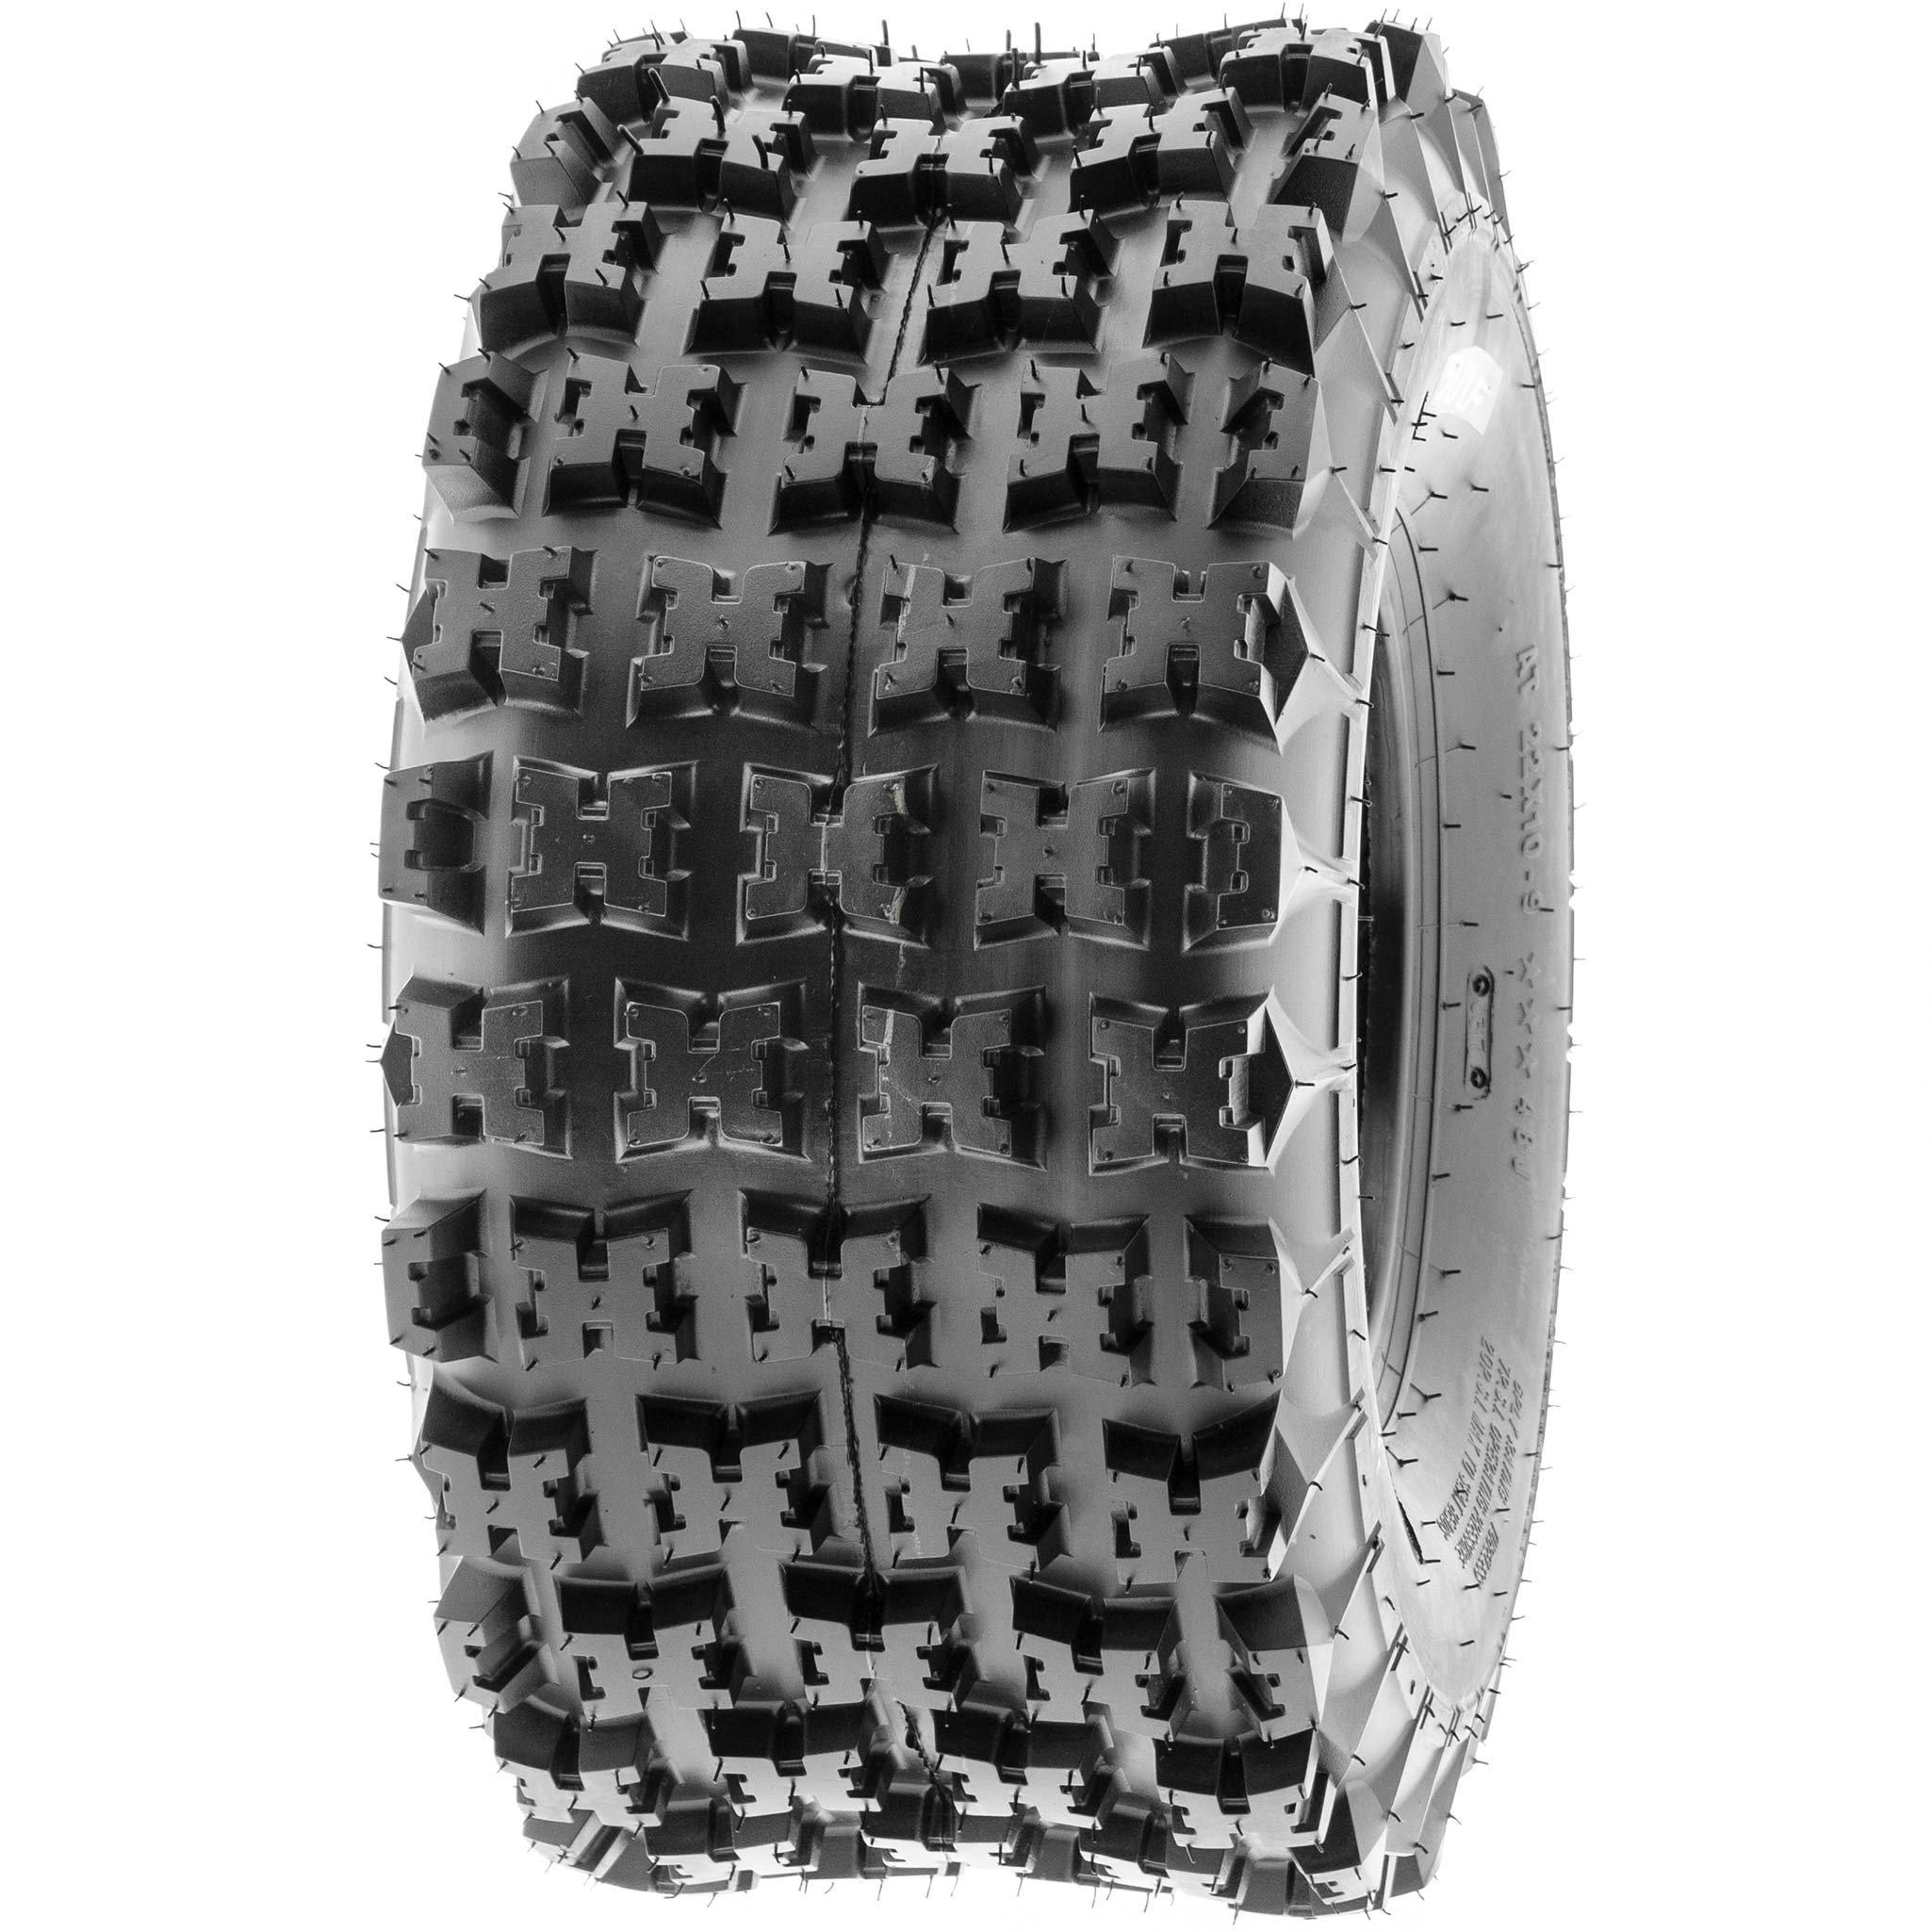 SunF 18x10.5-8 18x10.5x8 ATV UTV All Terrain Race Replacement 6 PR Tubeless Tires A027, [Set of 2] by SunF (Image #8)